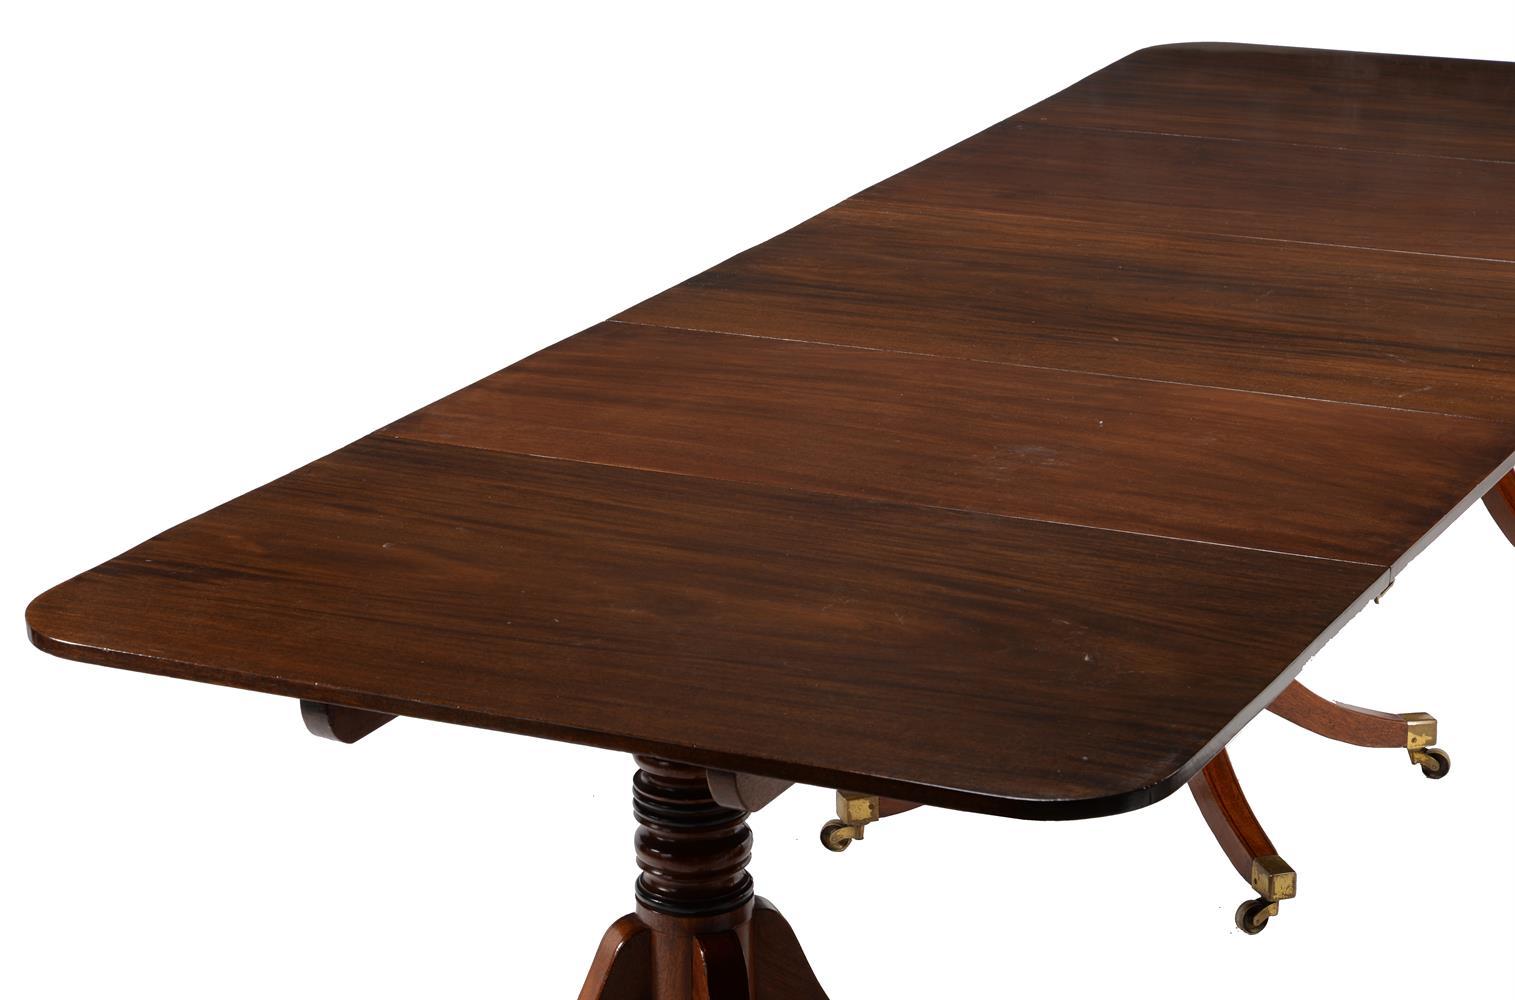 A REGENCY MAHOGANY TRIPLE PILLAR EXTENDING DINING TABLE, CIRCA 1815 - Image 3 of 3